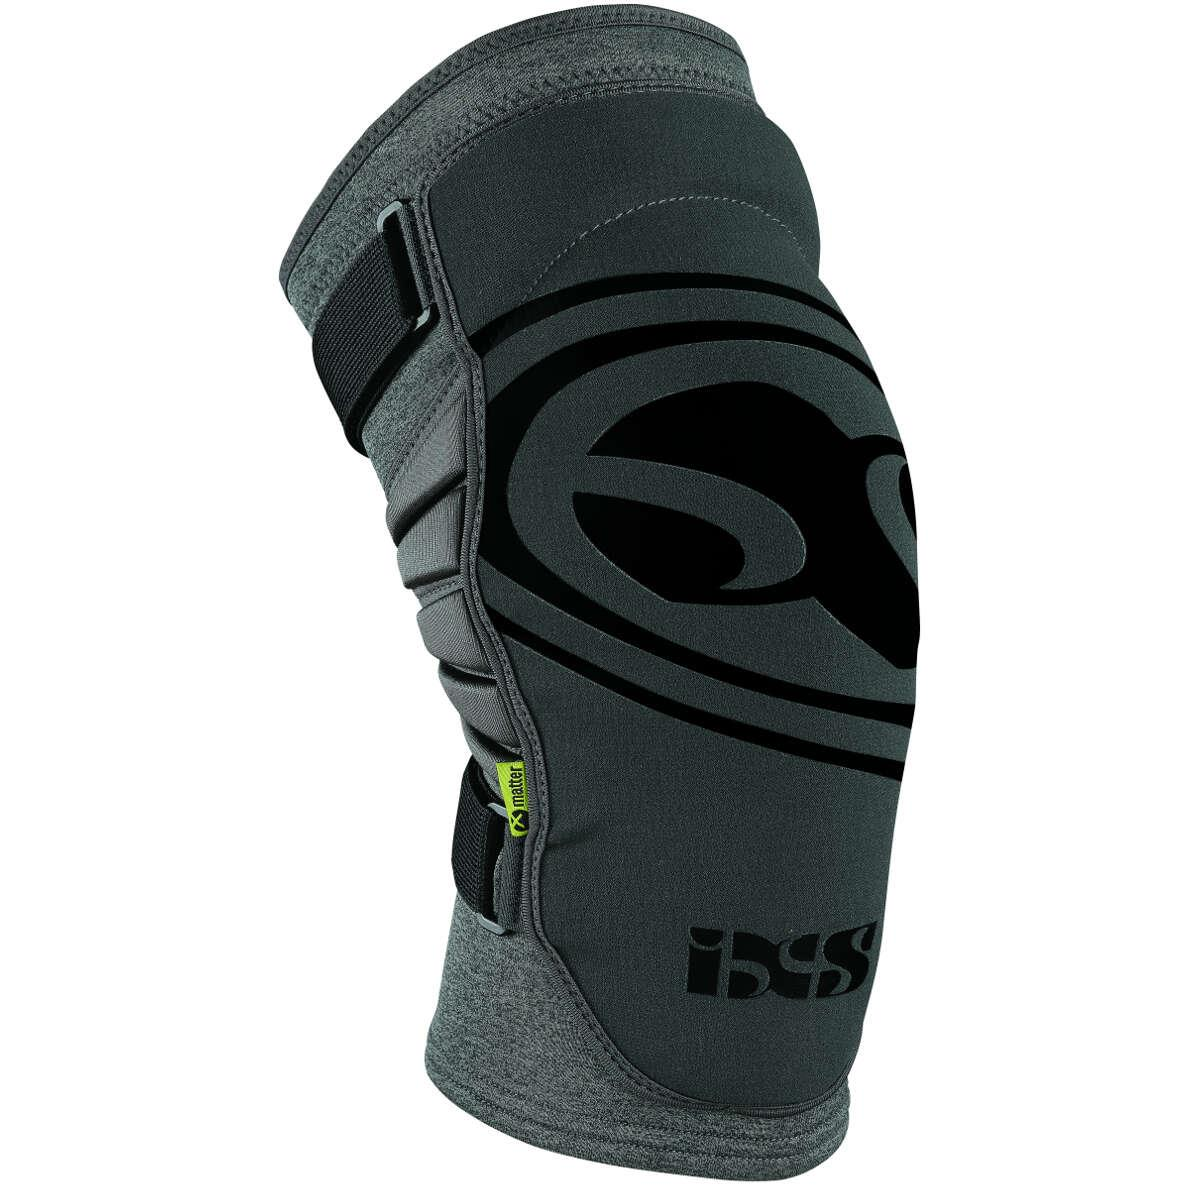 Carve Evo+ knee pads size L gray